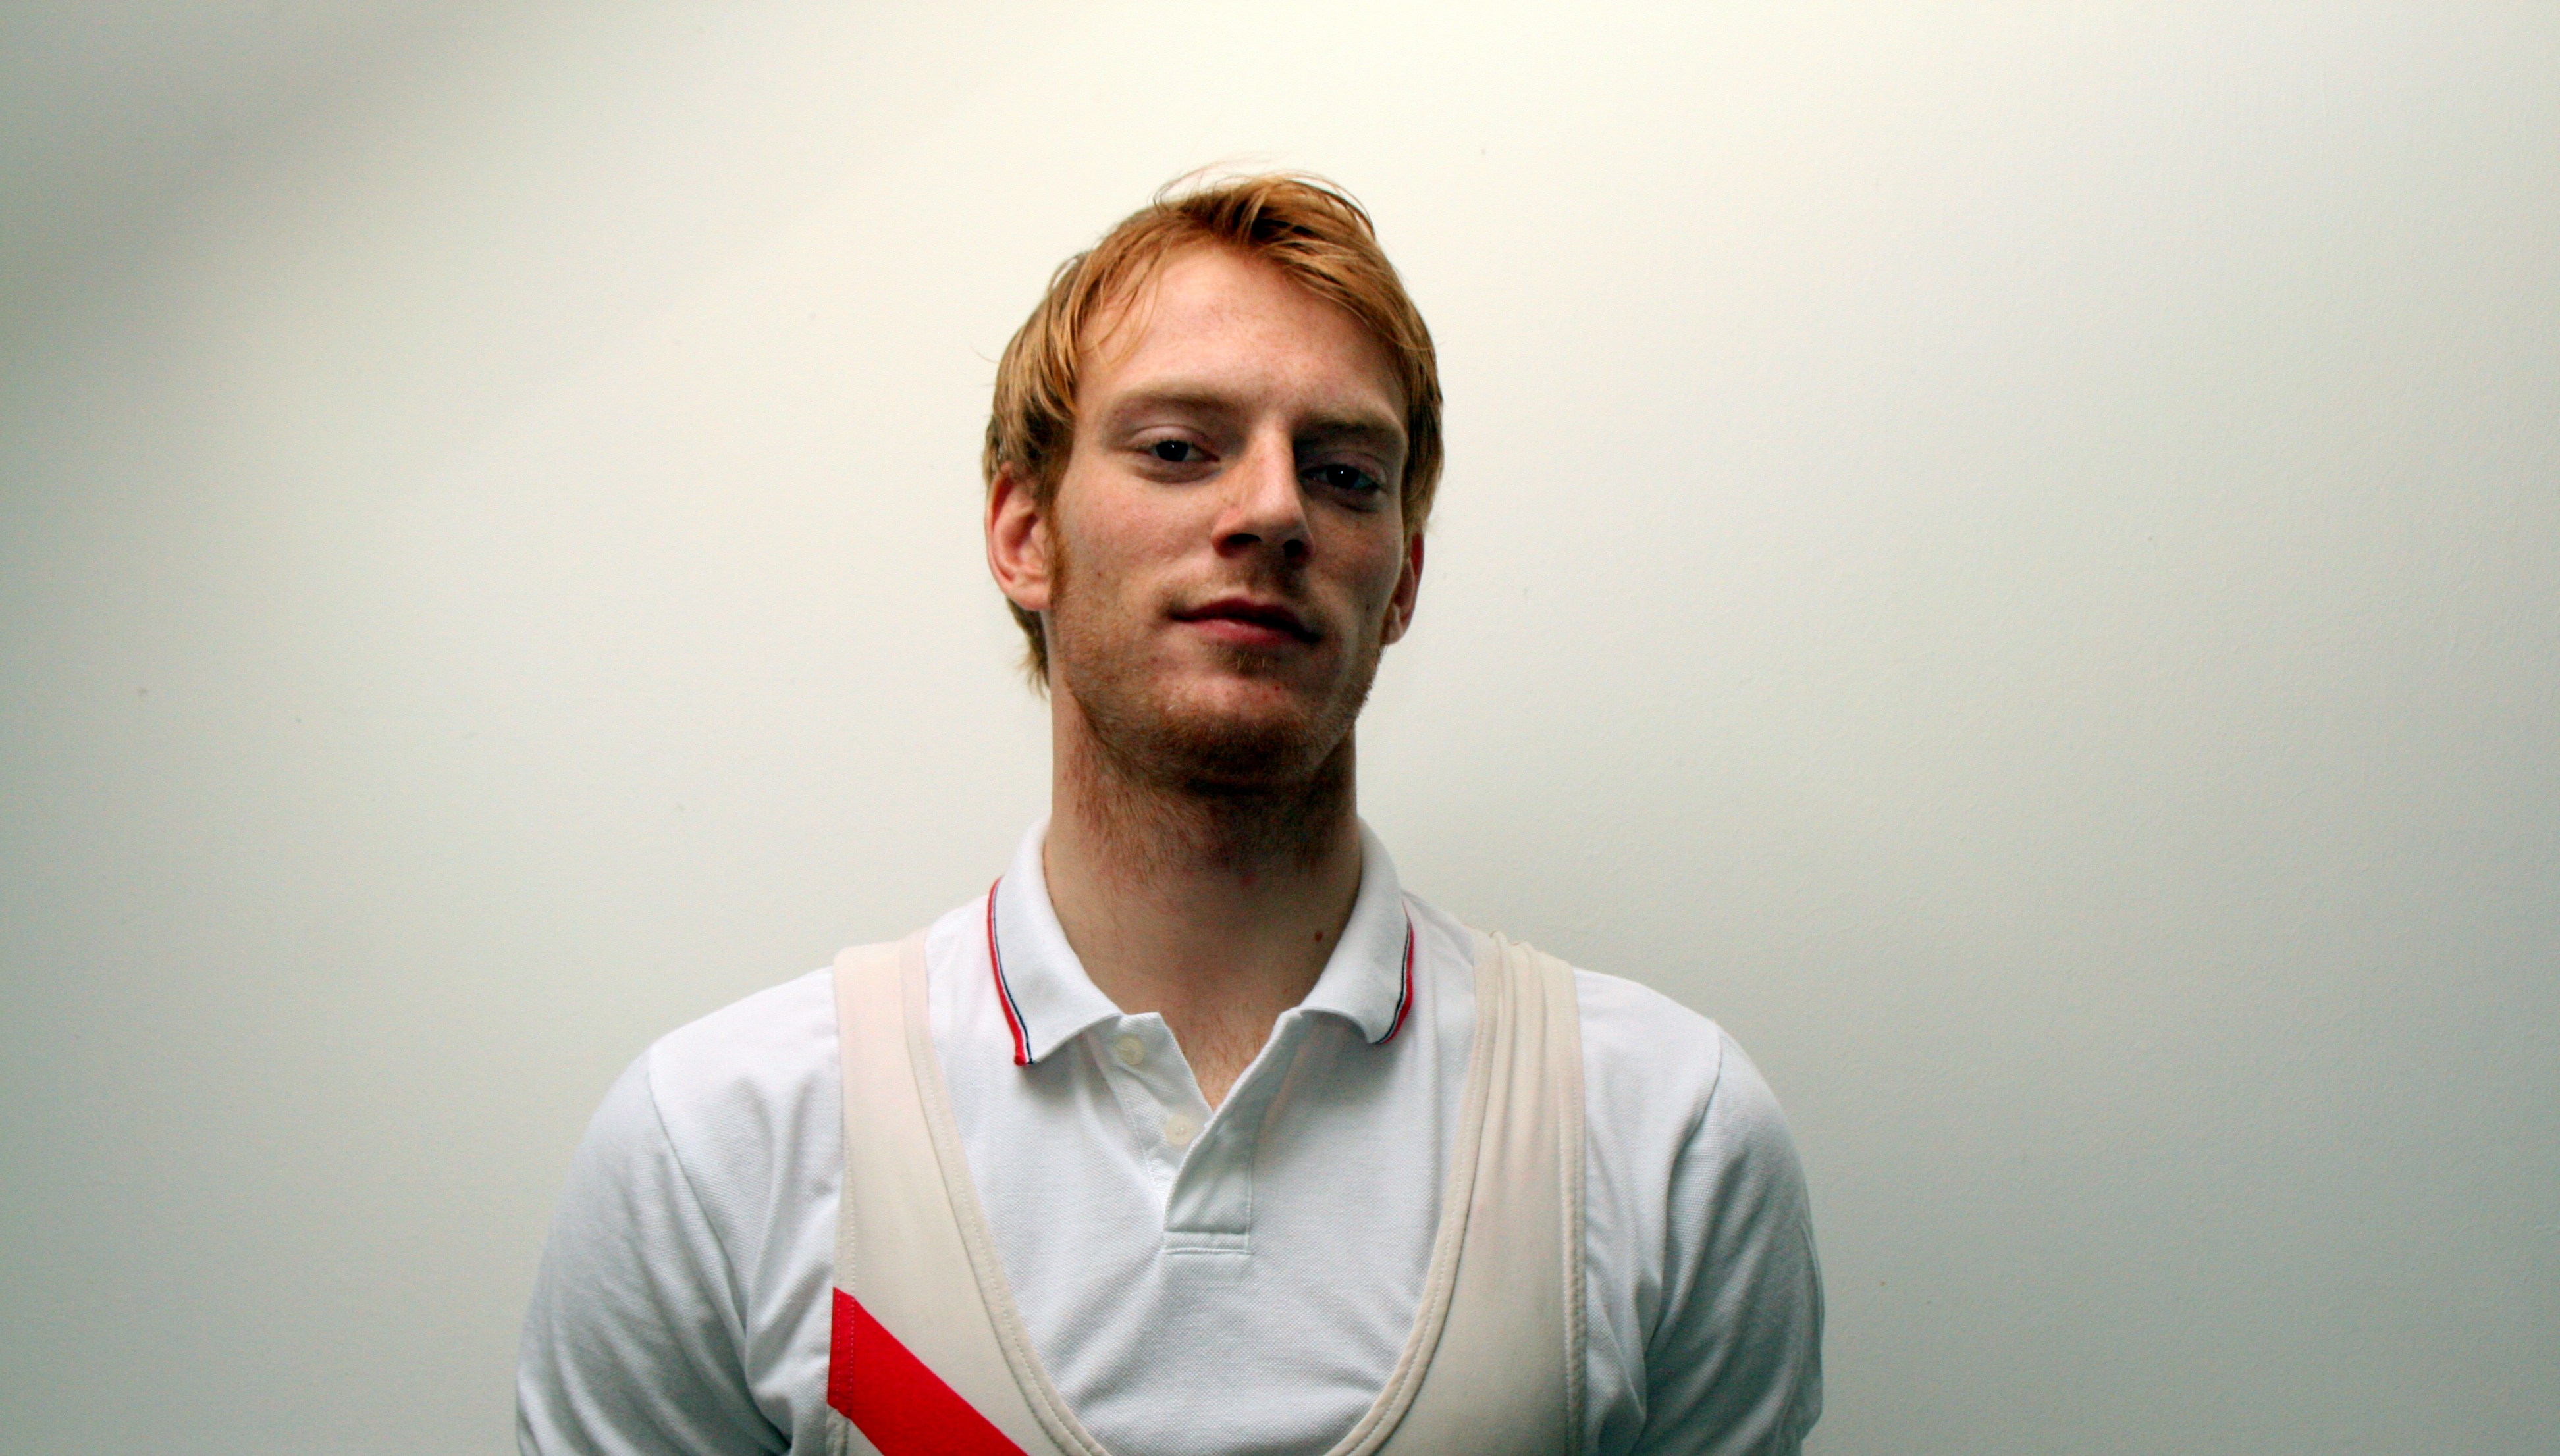 Matthias Kielhorn